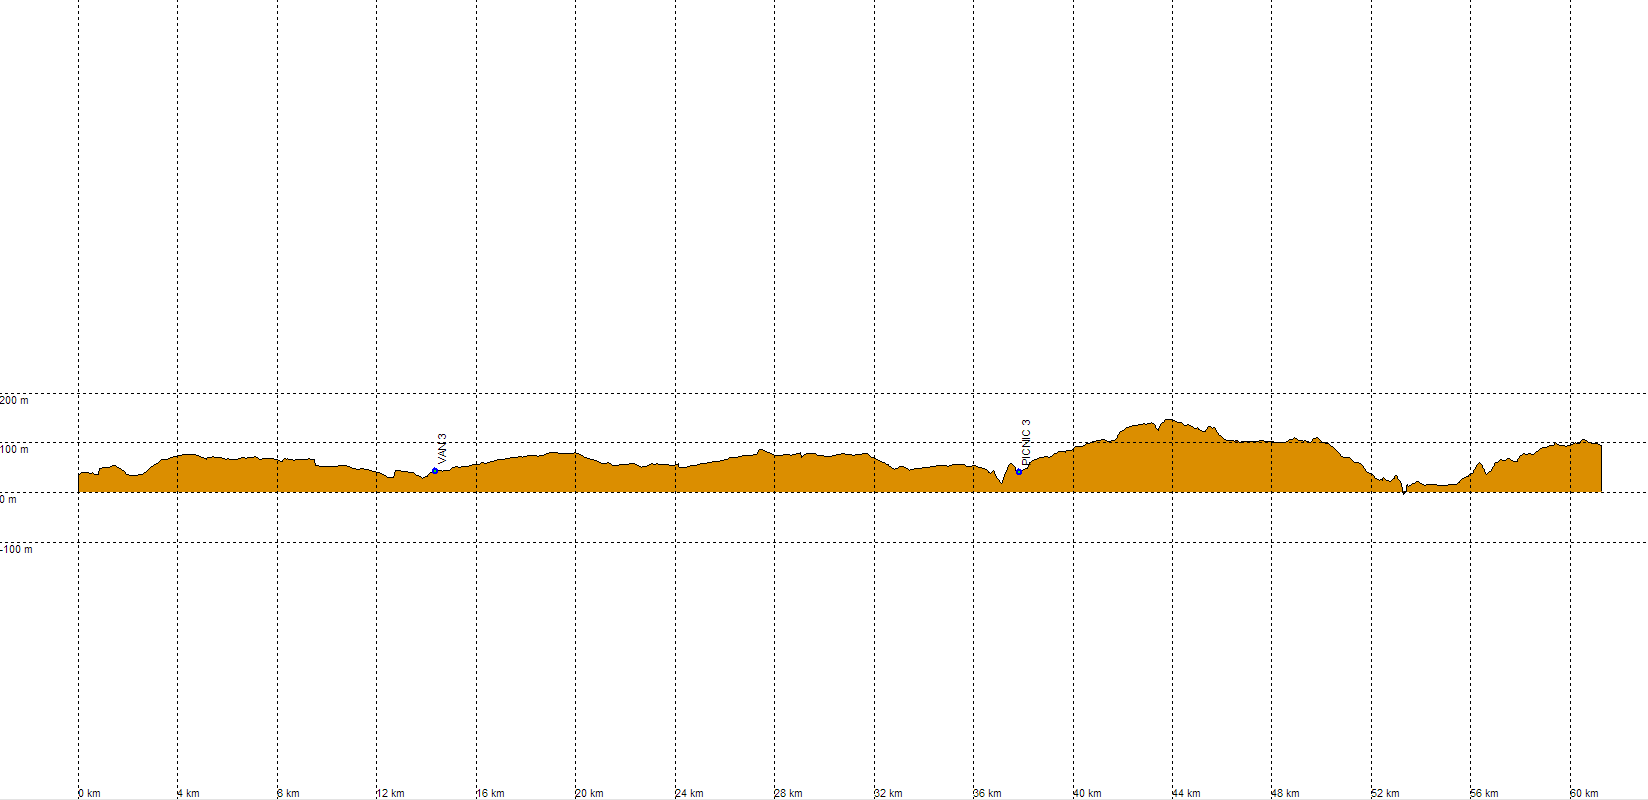 Climbing Profile Beautiful Rota Vicentina, Hybrid Bike Tour in Portugal